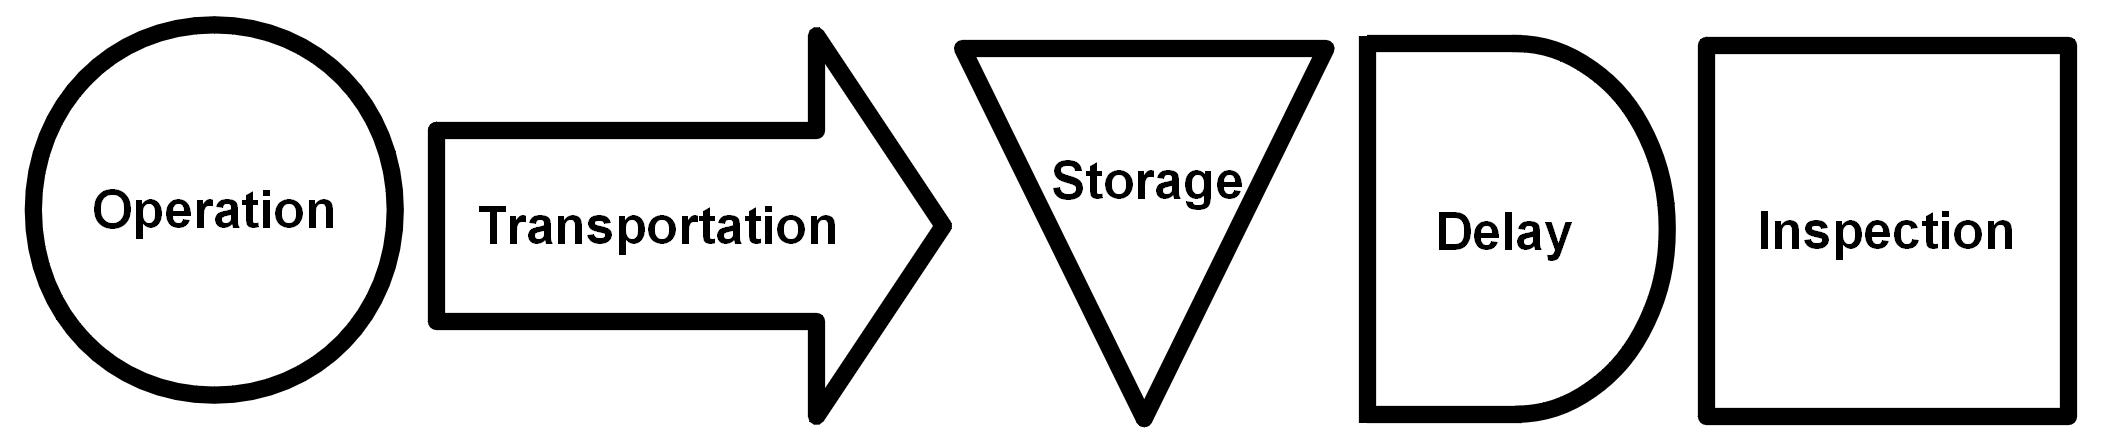 ASME standard set of process chart symbols